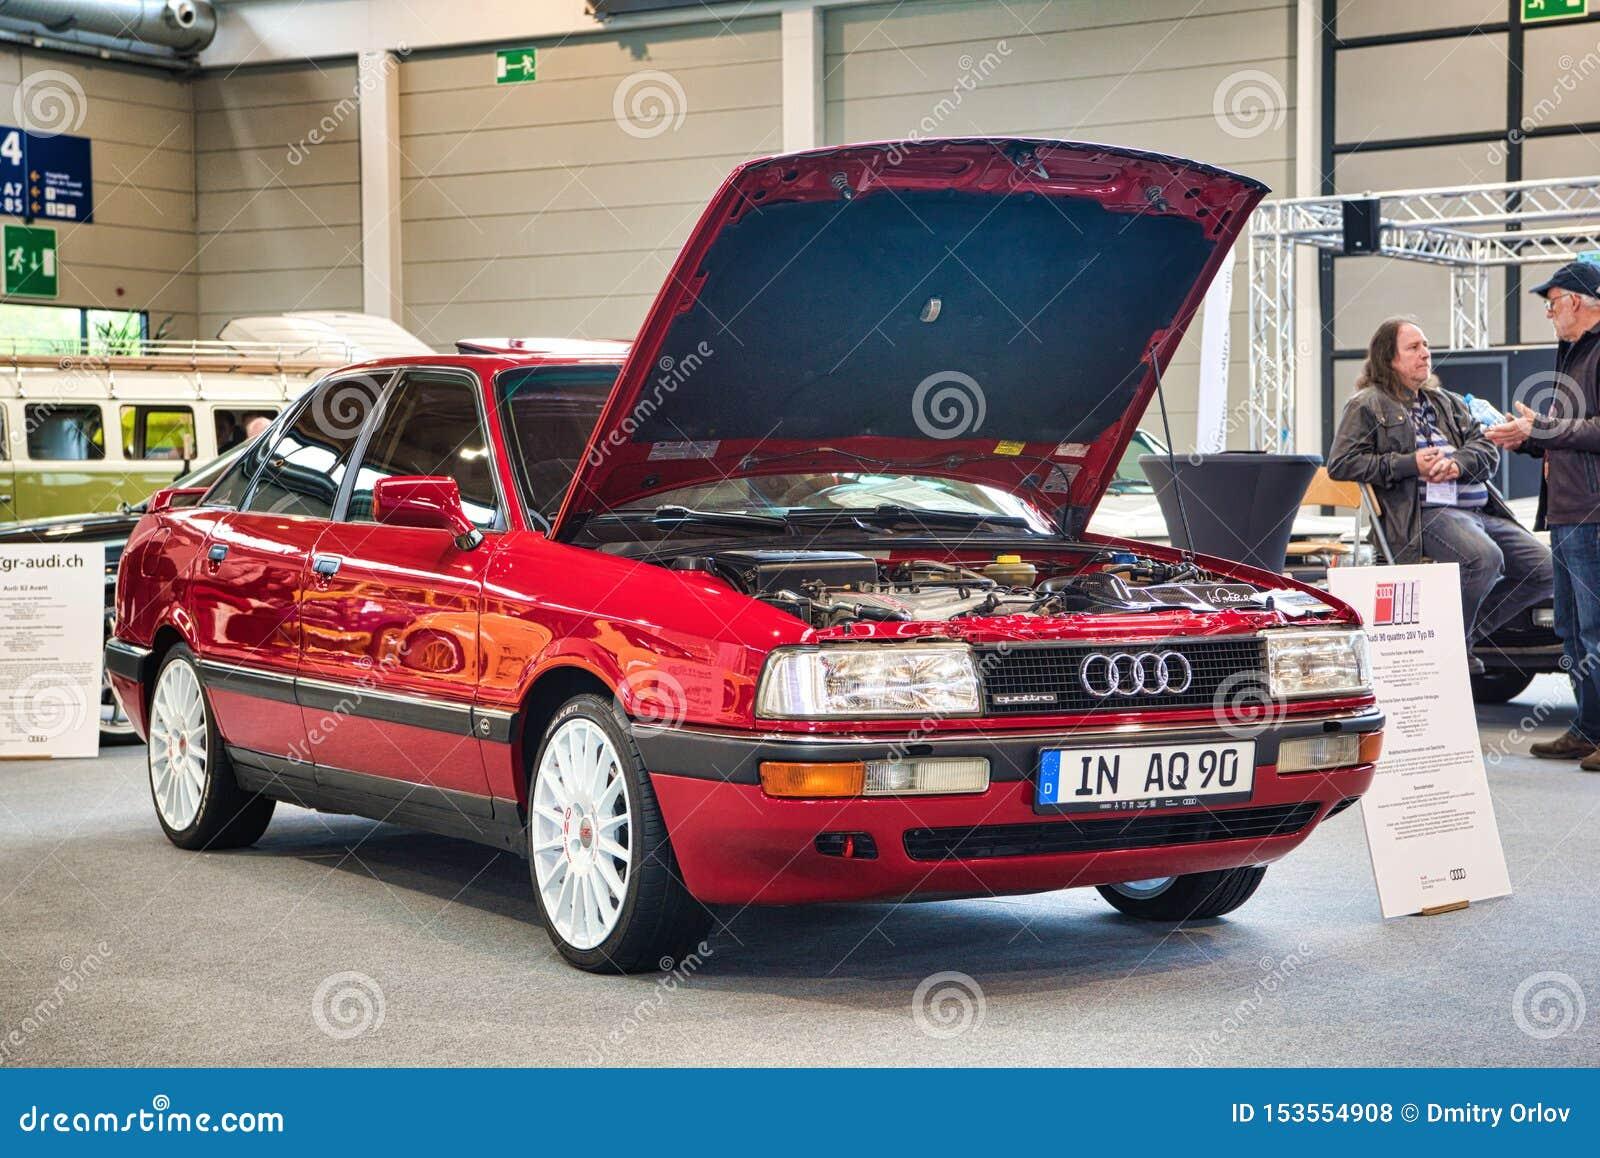 Kelebihan Kekurangan Audi 90 Quattro Murah Berkualitas